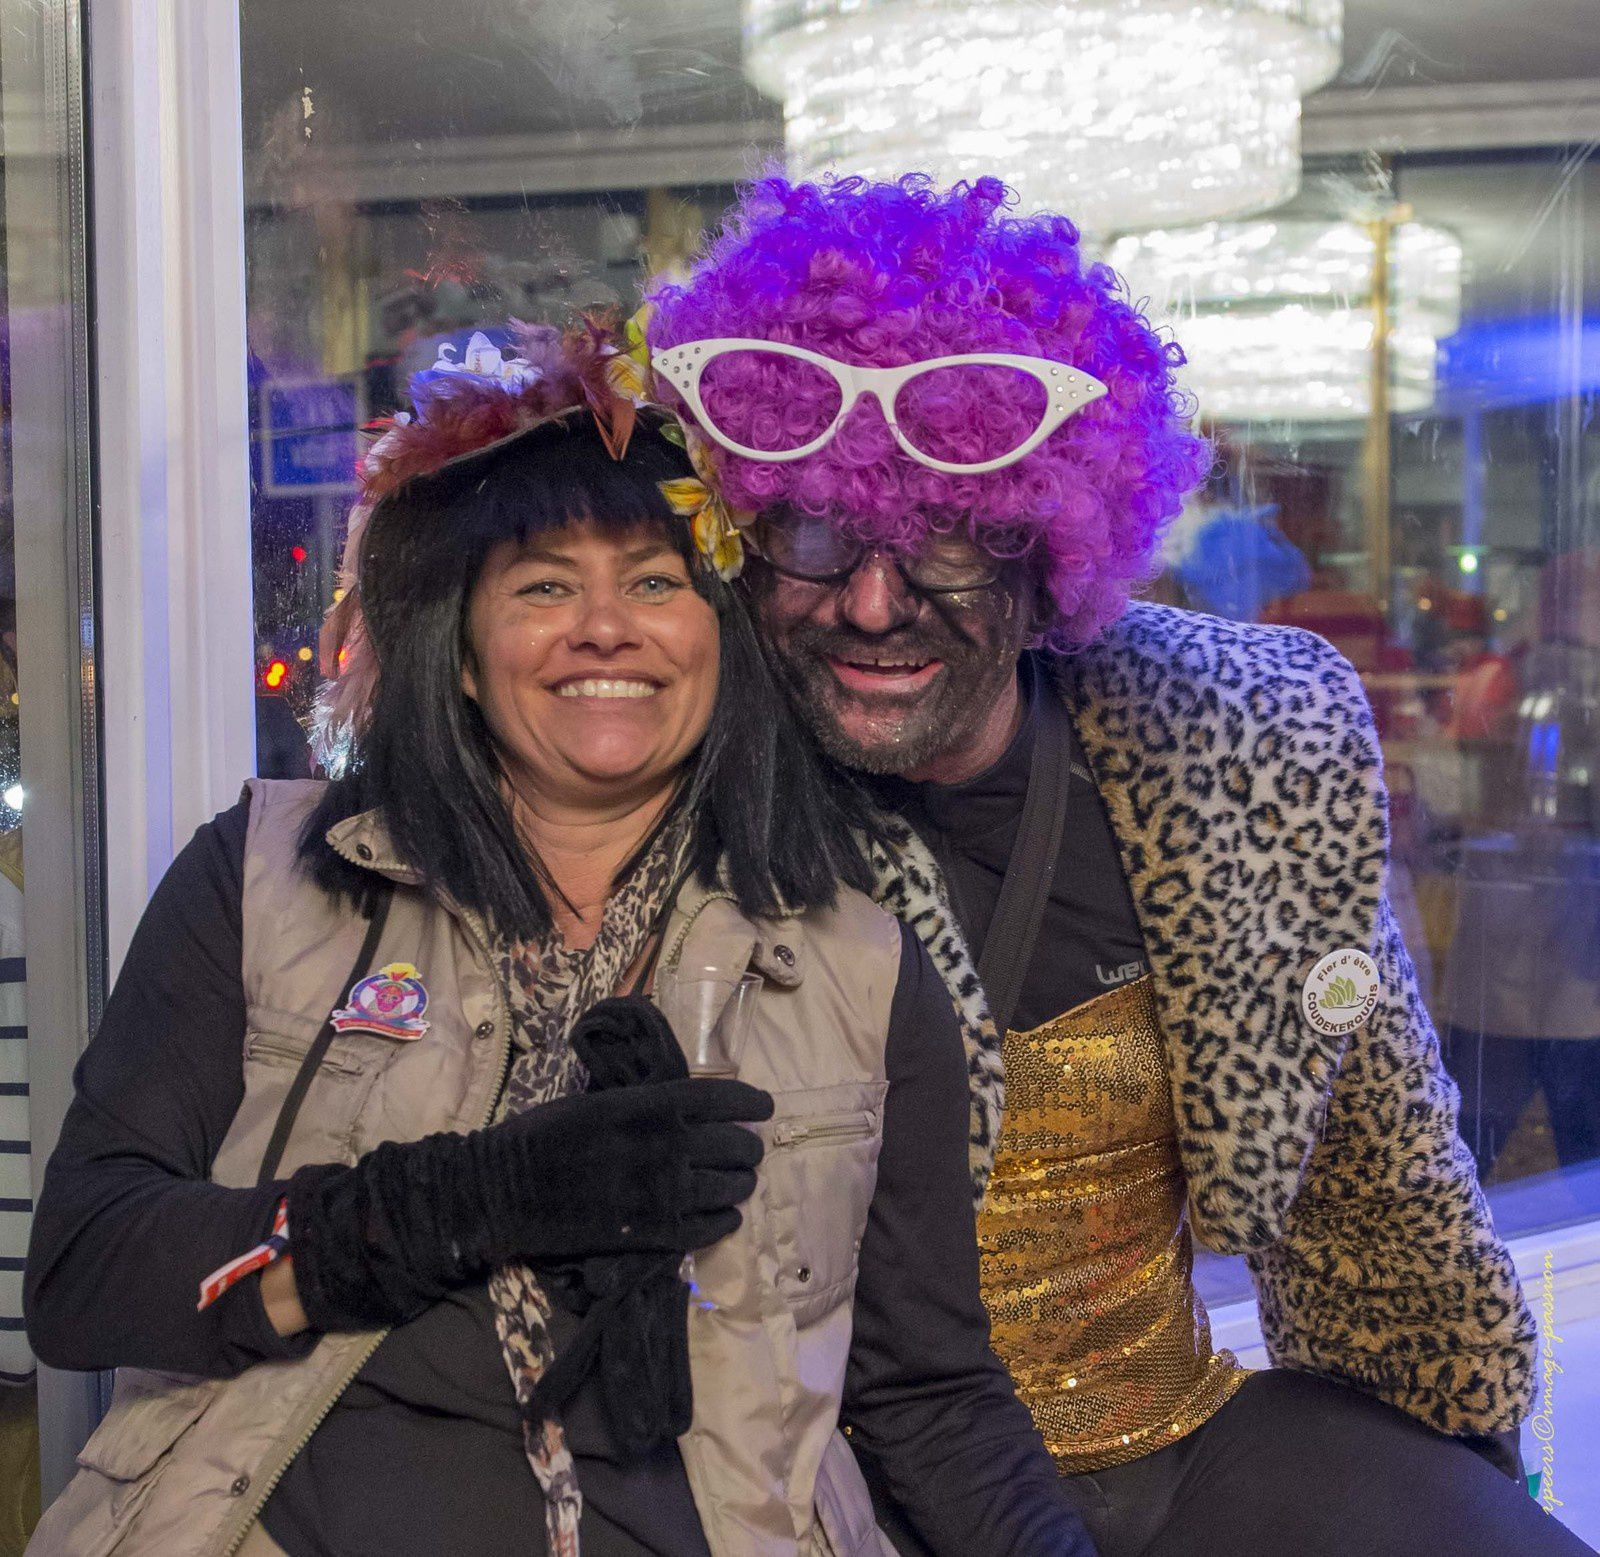 Bande de la Citadelle - Carnaval de Dunkerque 2017